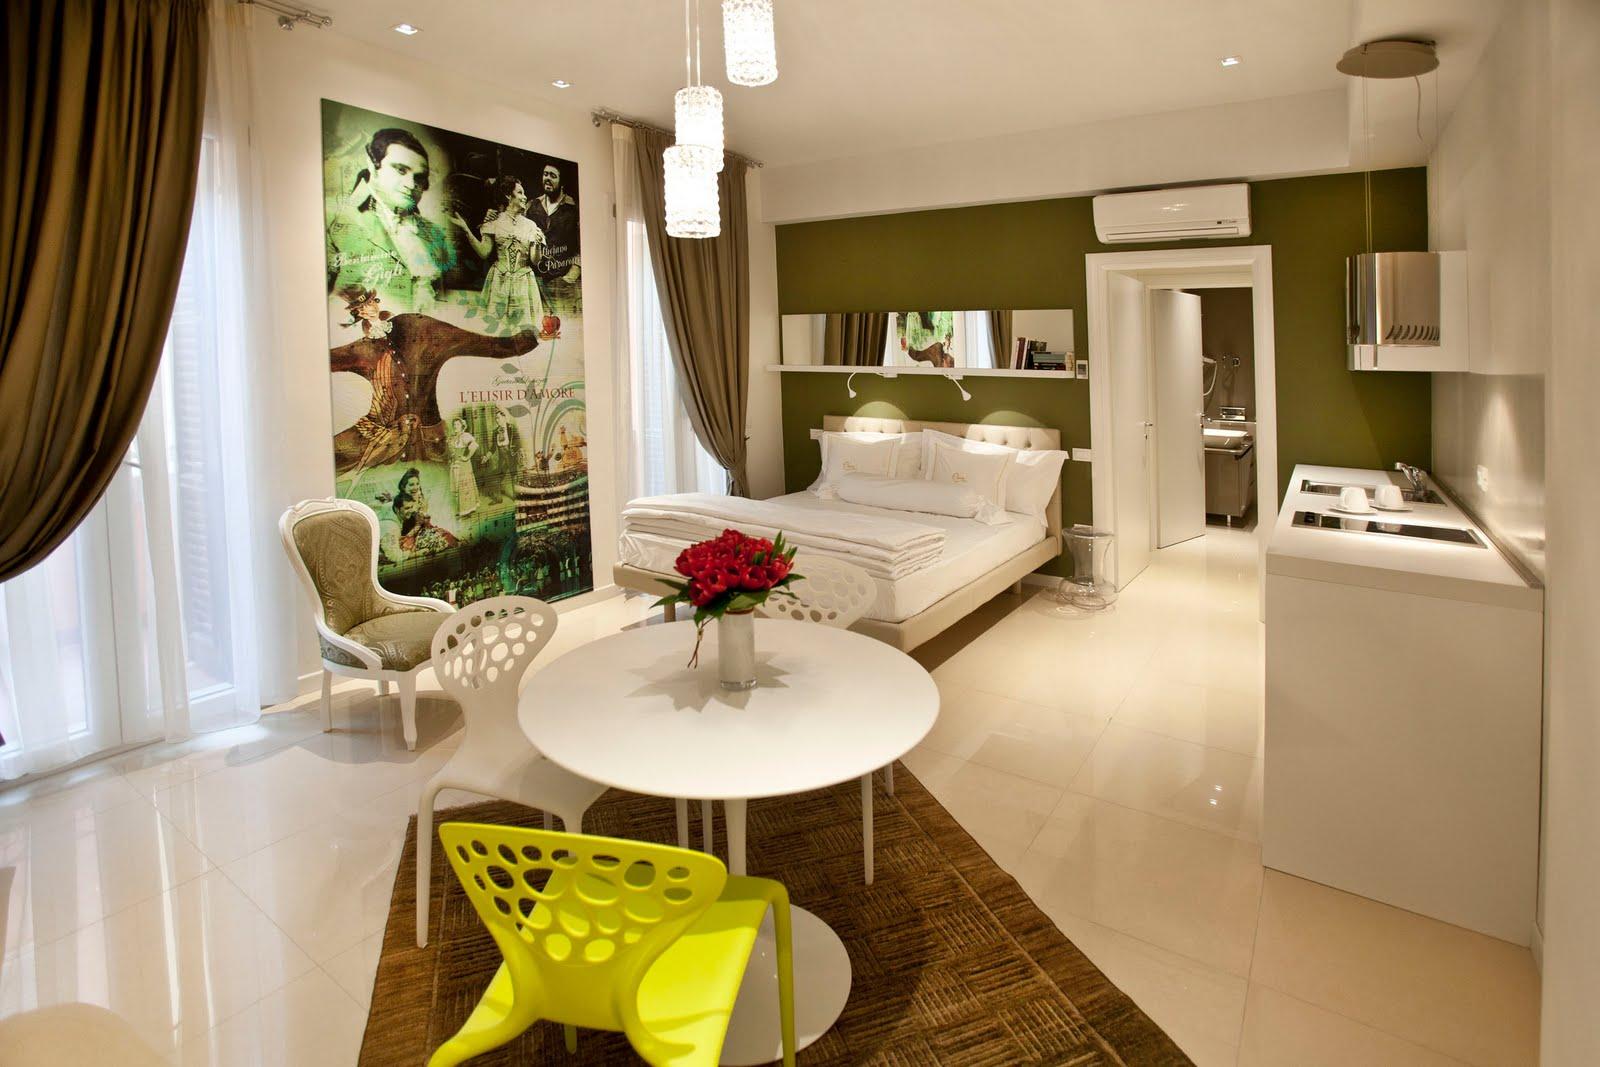 vacanze architettura design appartamenti a verona